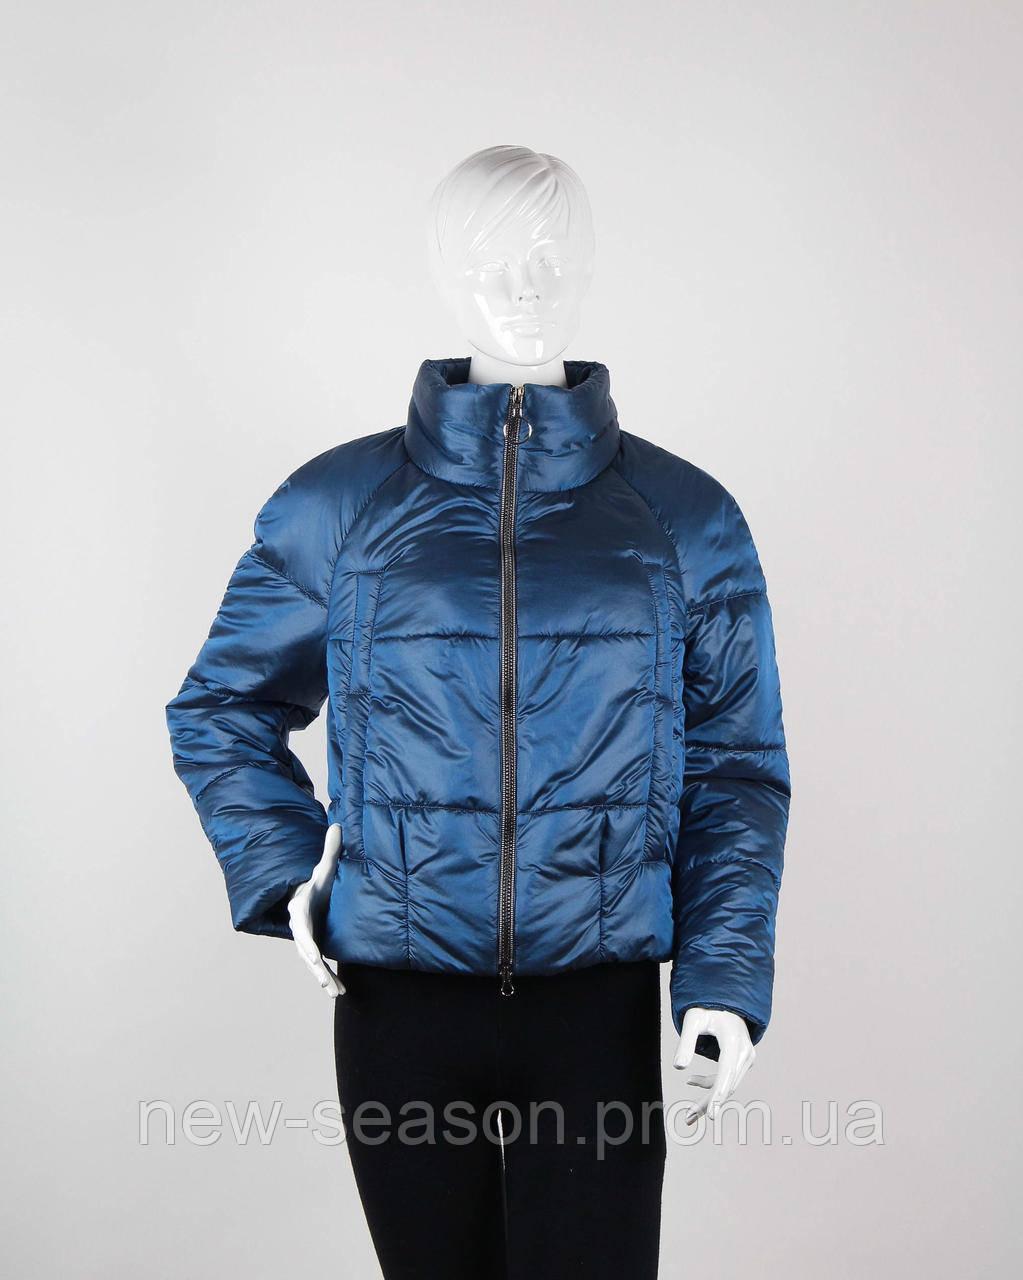 Куртка демисезонная бомбер Goods Fancy 2706 marine blue